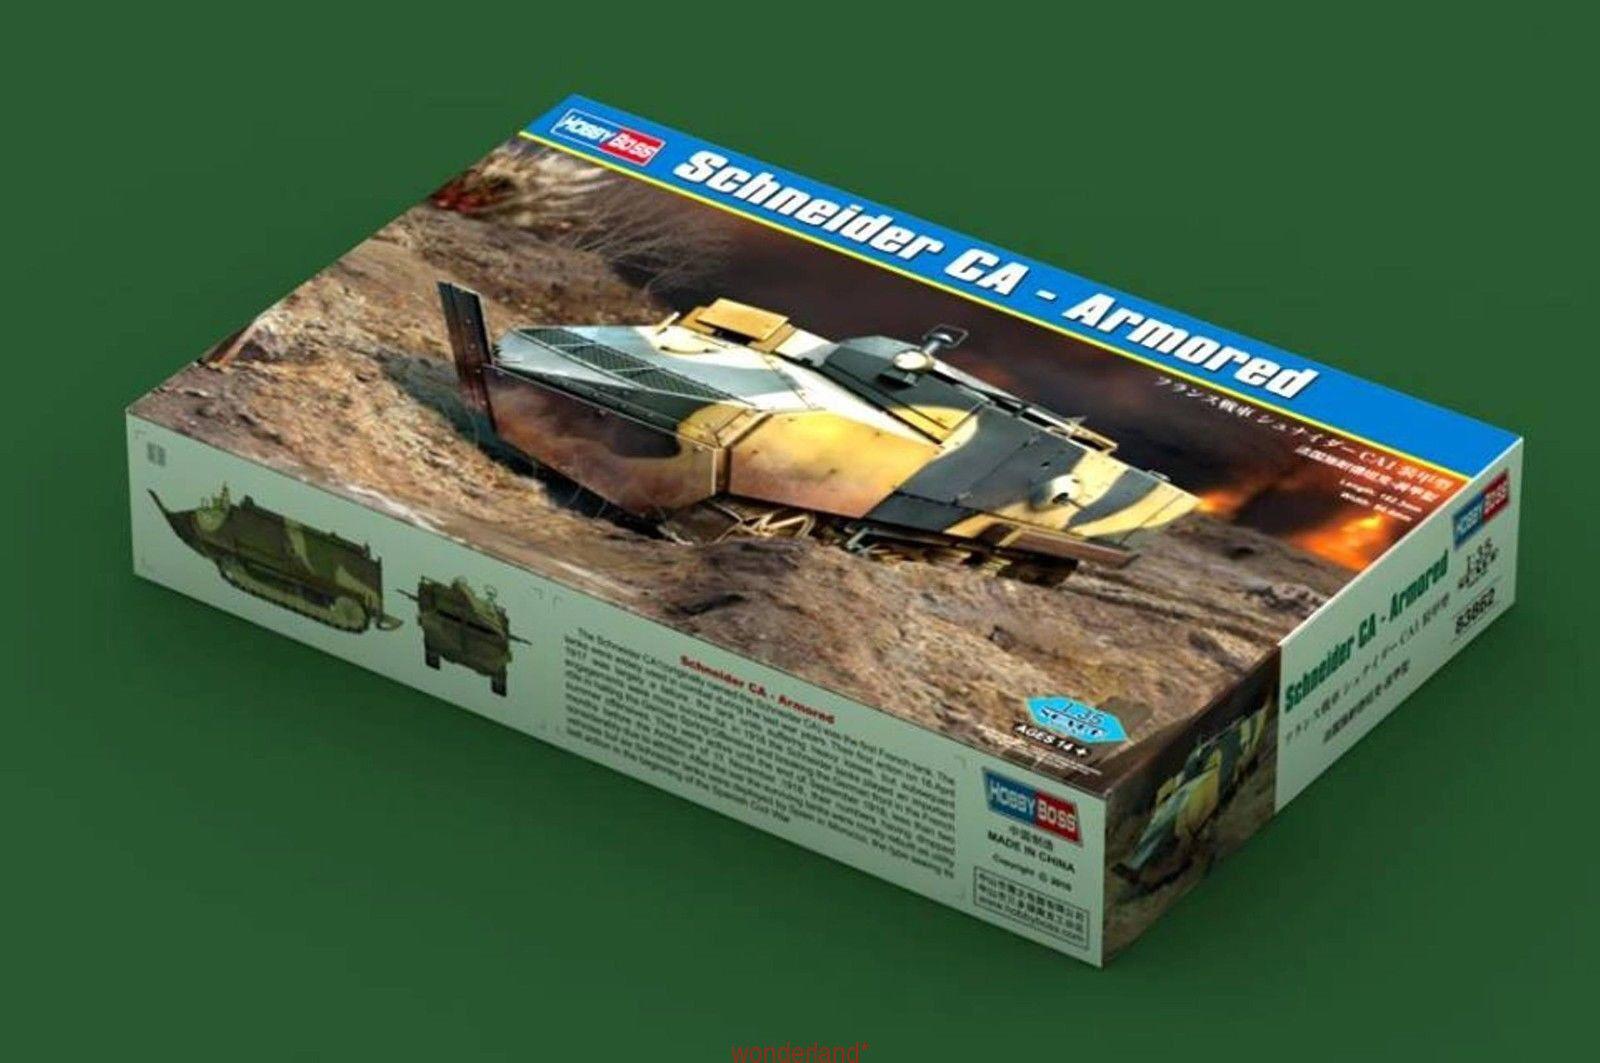 Hobbyboss 83862 1 35 Schneider CA - Armored